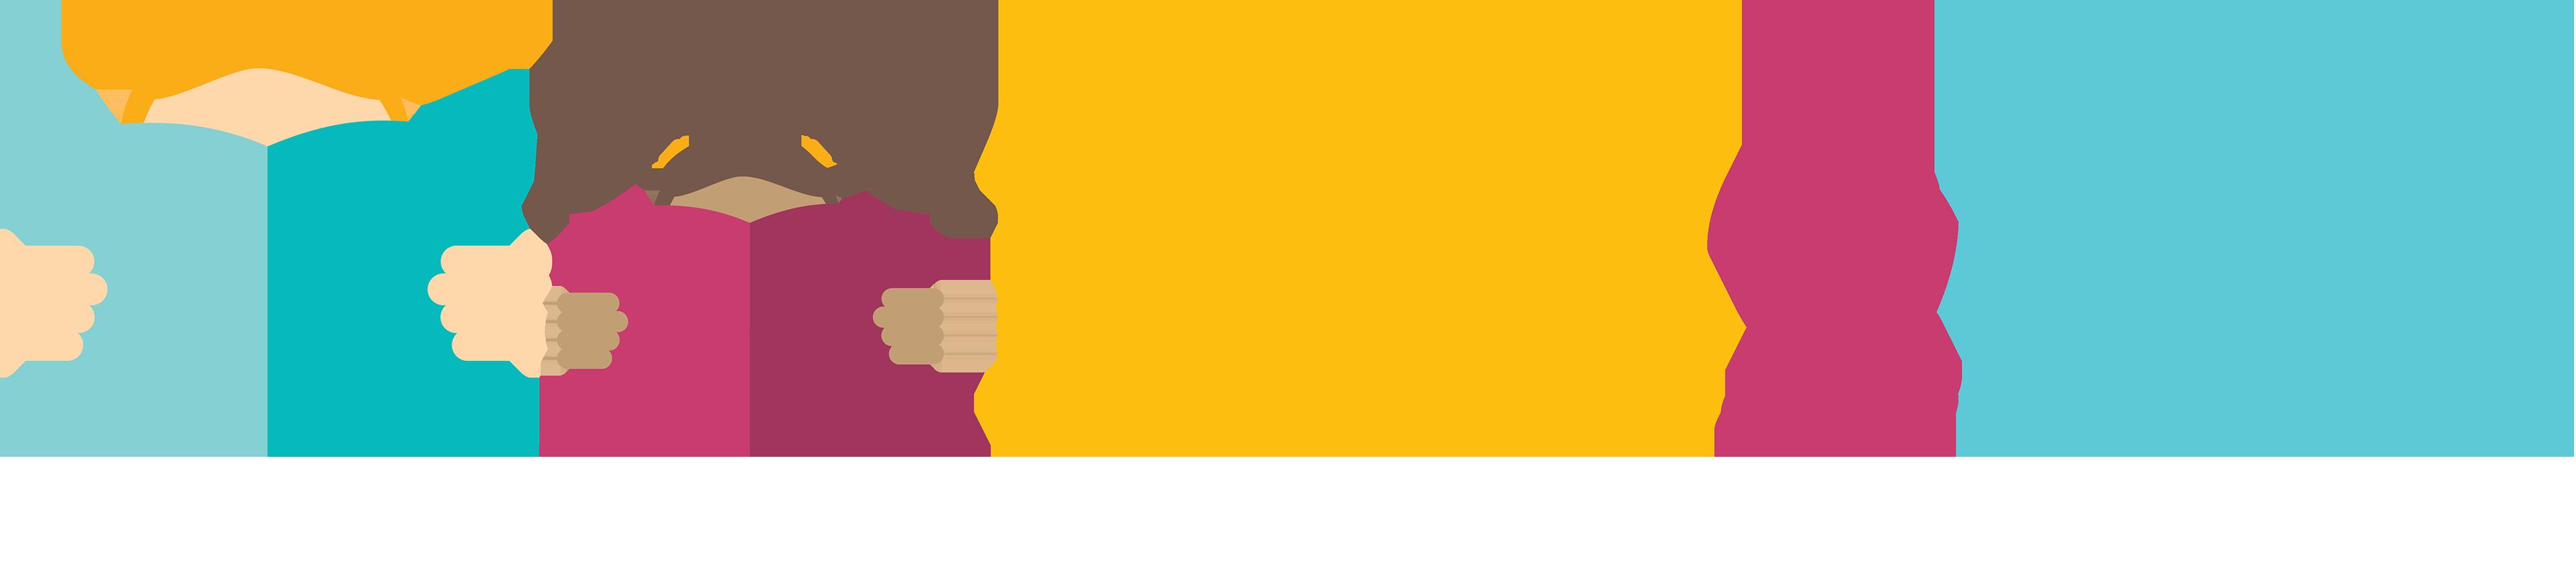 read2kids-logo-hrzntl